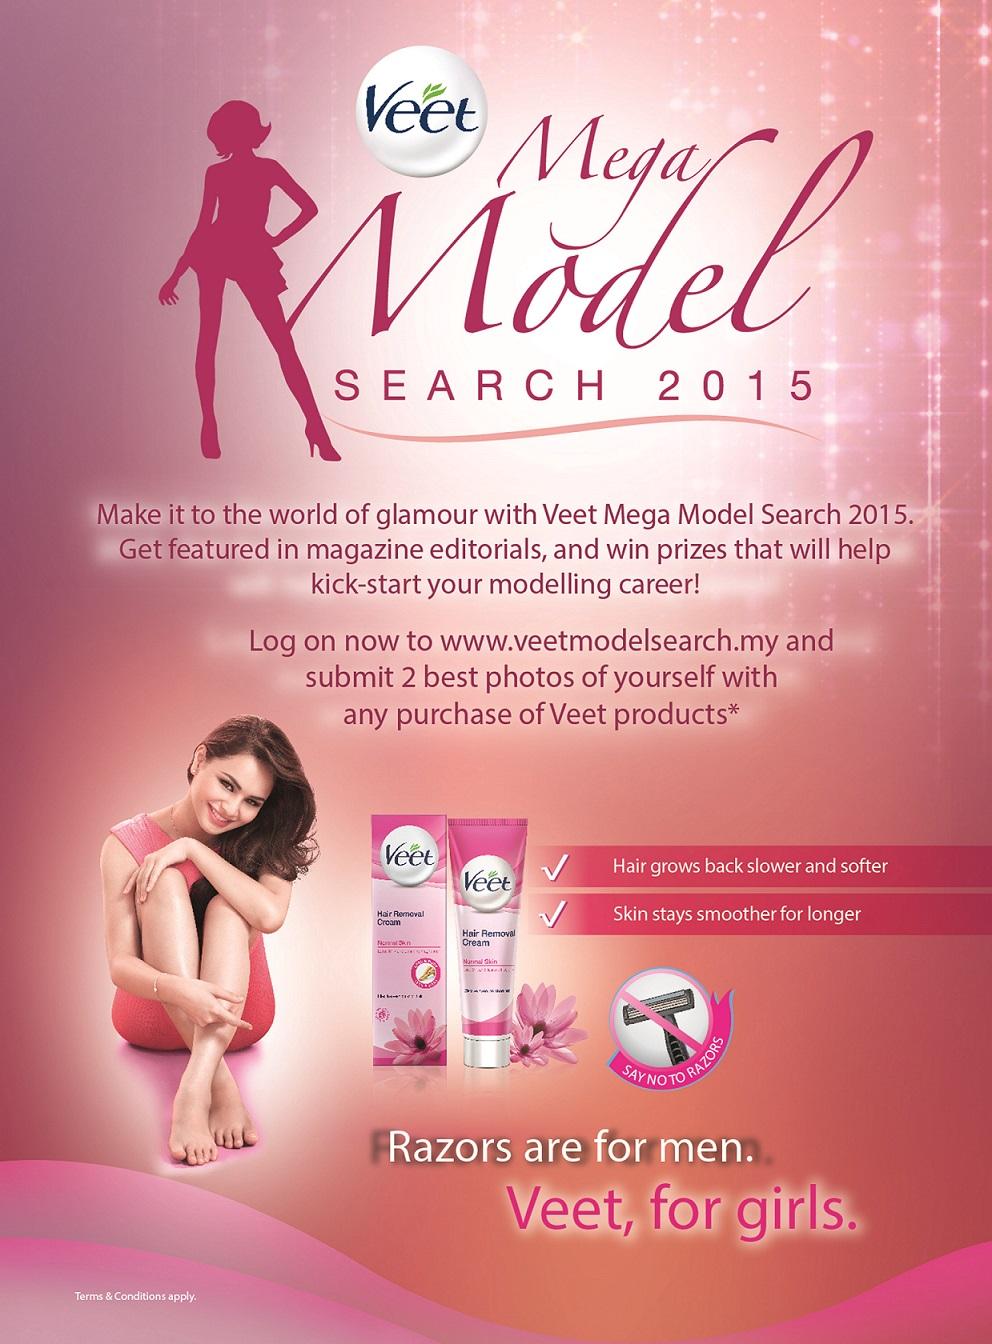 Veet Mega Model Search 2015 Key Visual